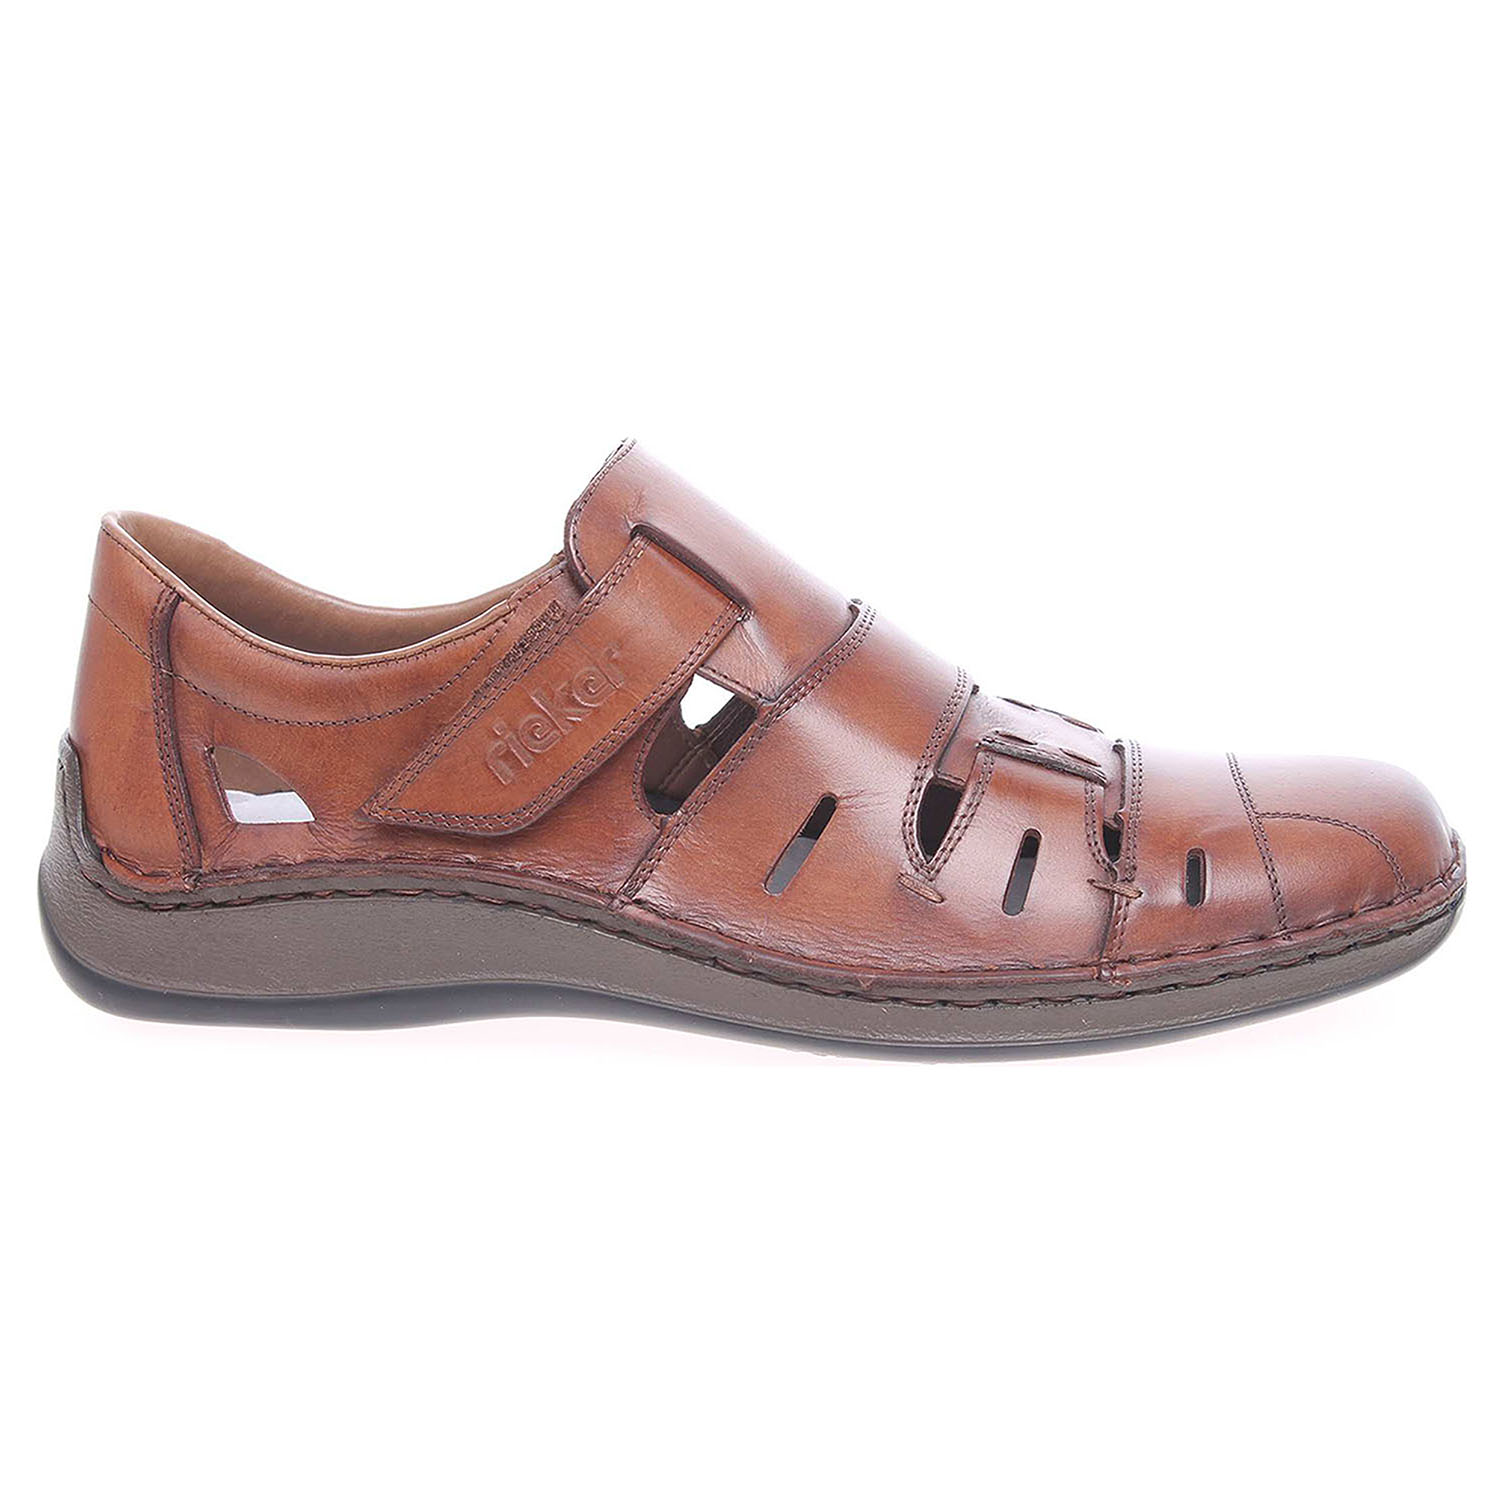 Rieker pánské sandály 05257-25 hnědé 46